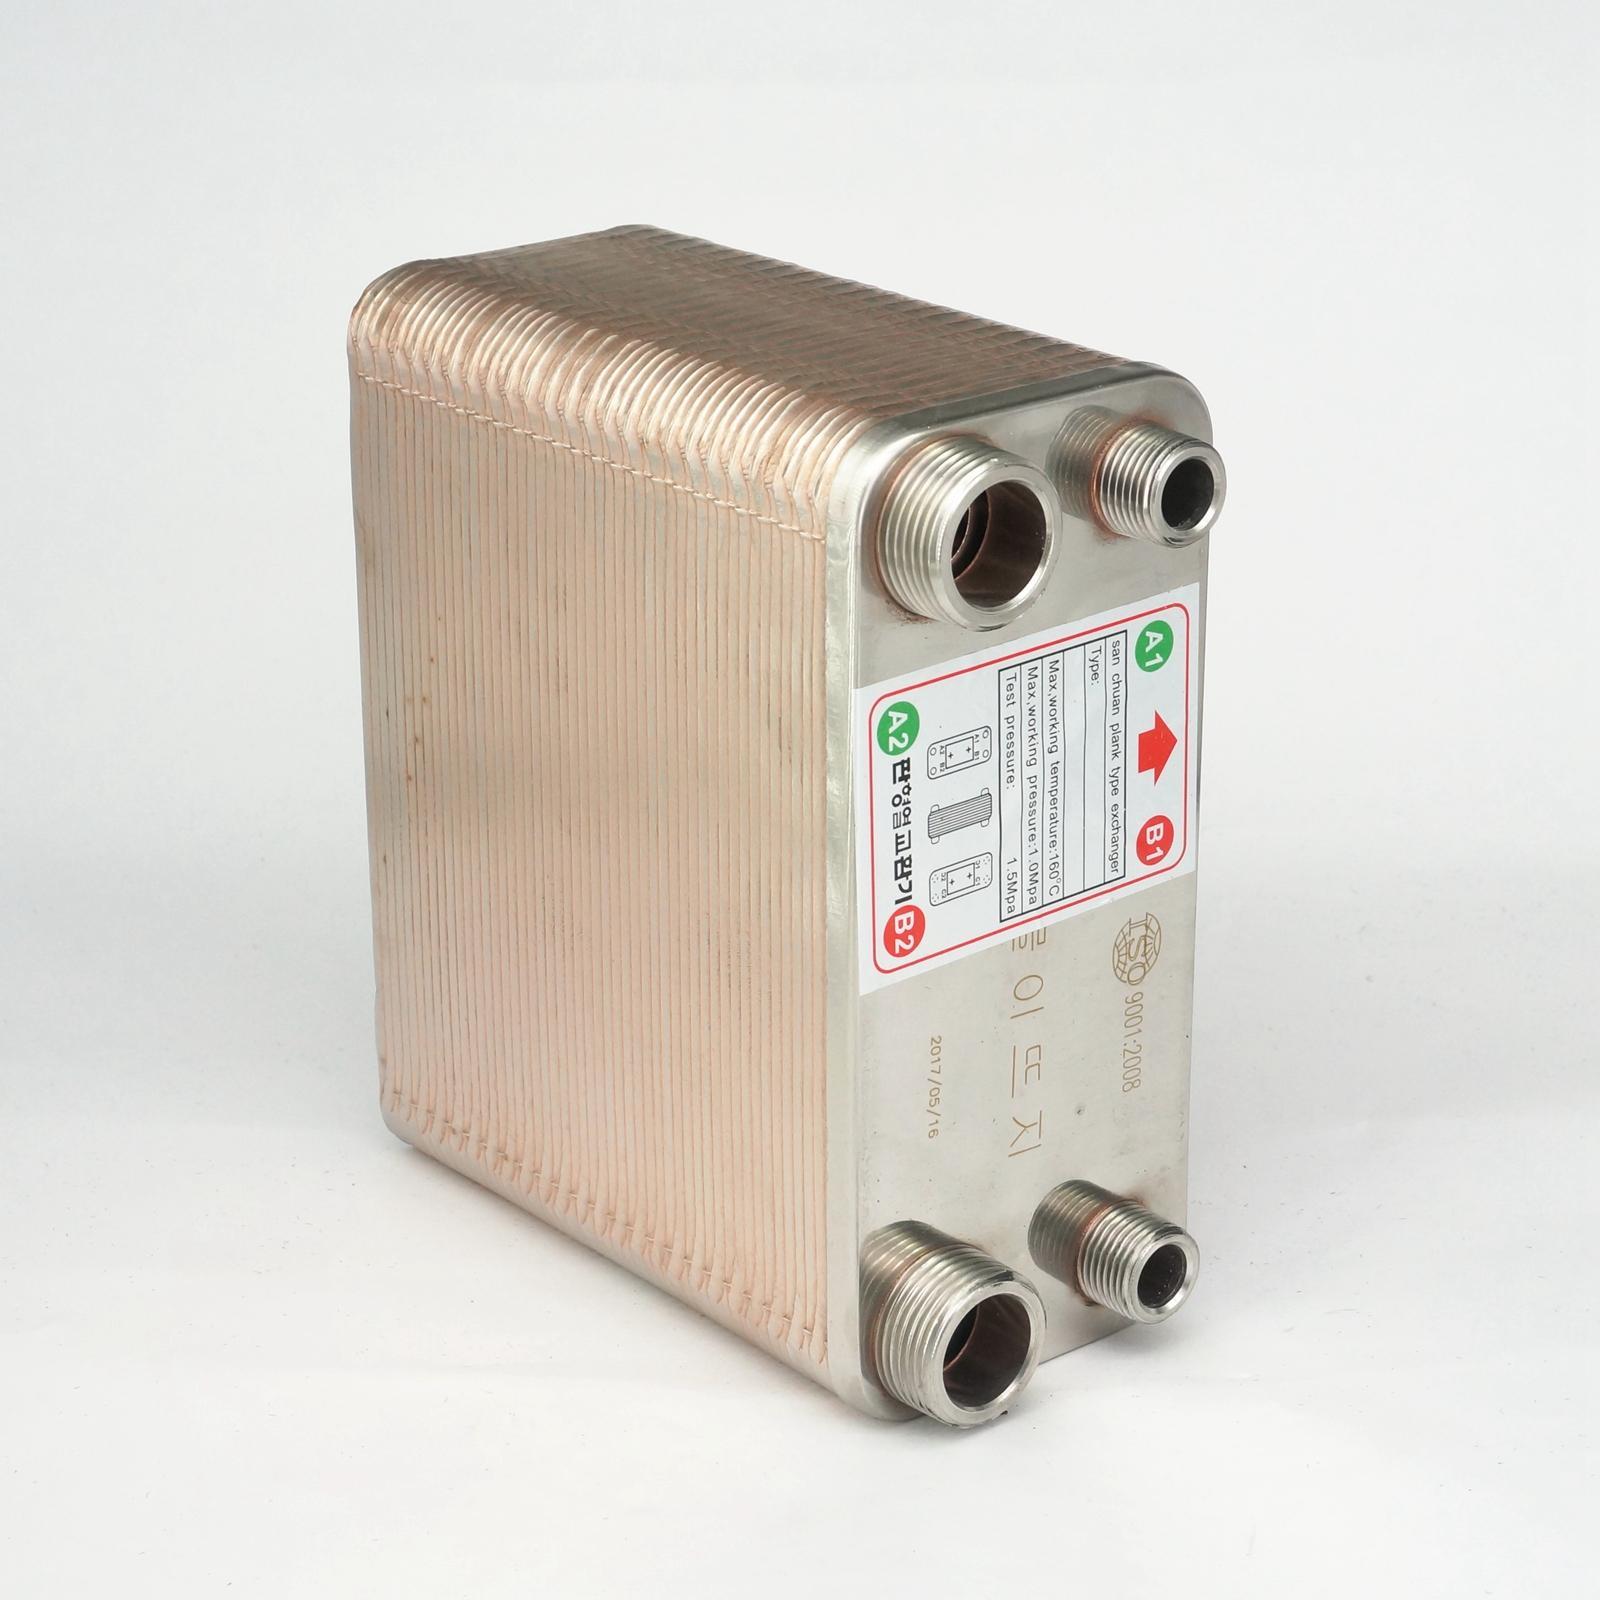 50 Plates Heat Exchanger Beer Wort Chiller Cooler 304 Stainless Steel For Home Brewing Beer